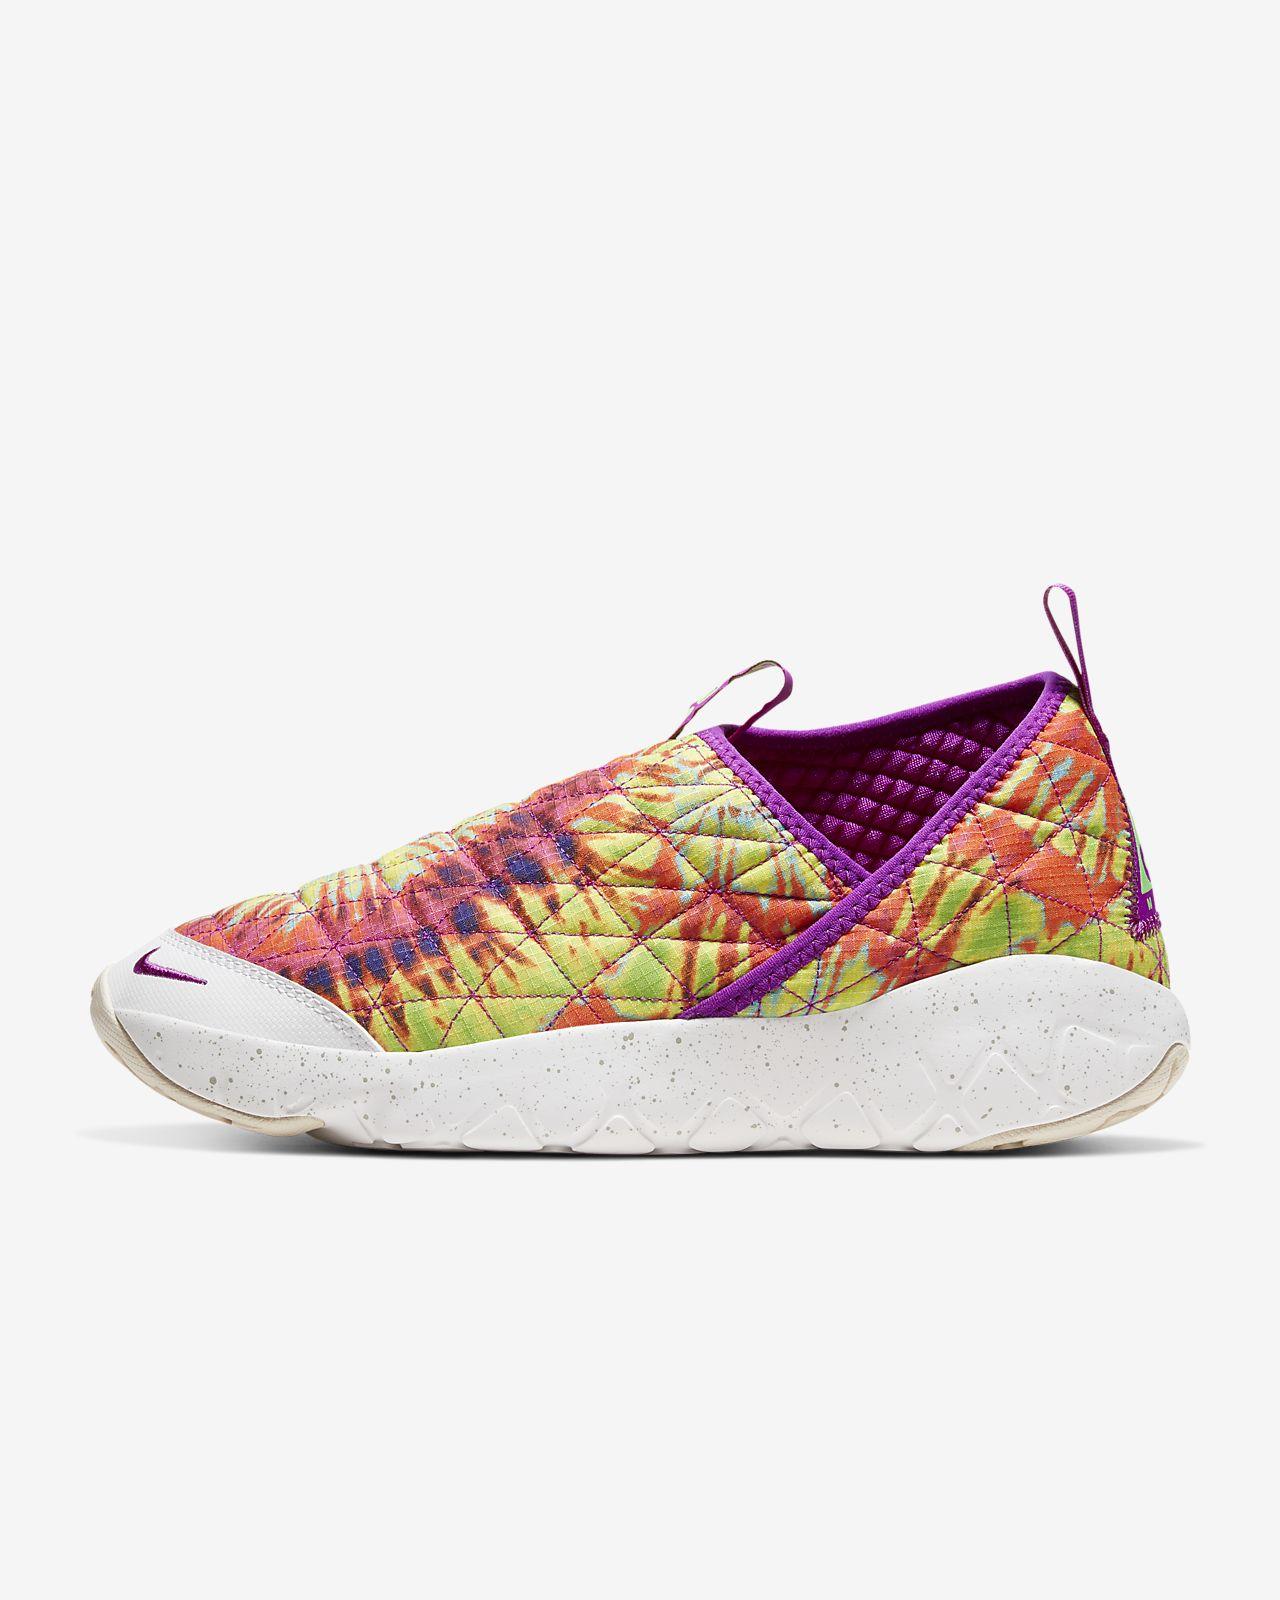 Calzado Nike ACG MOC 3.0